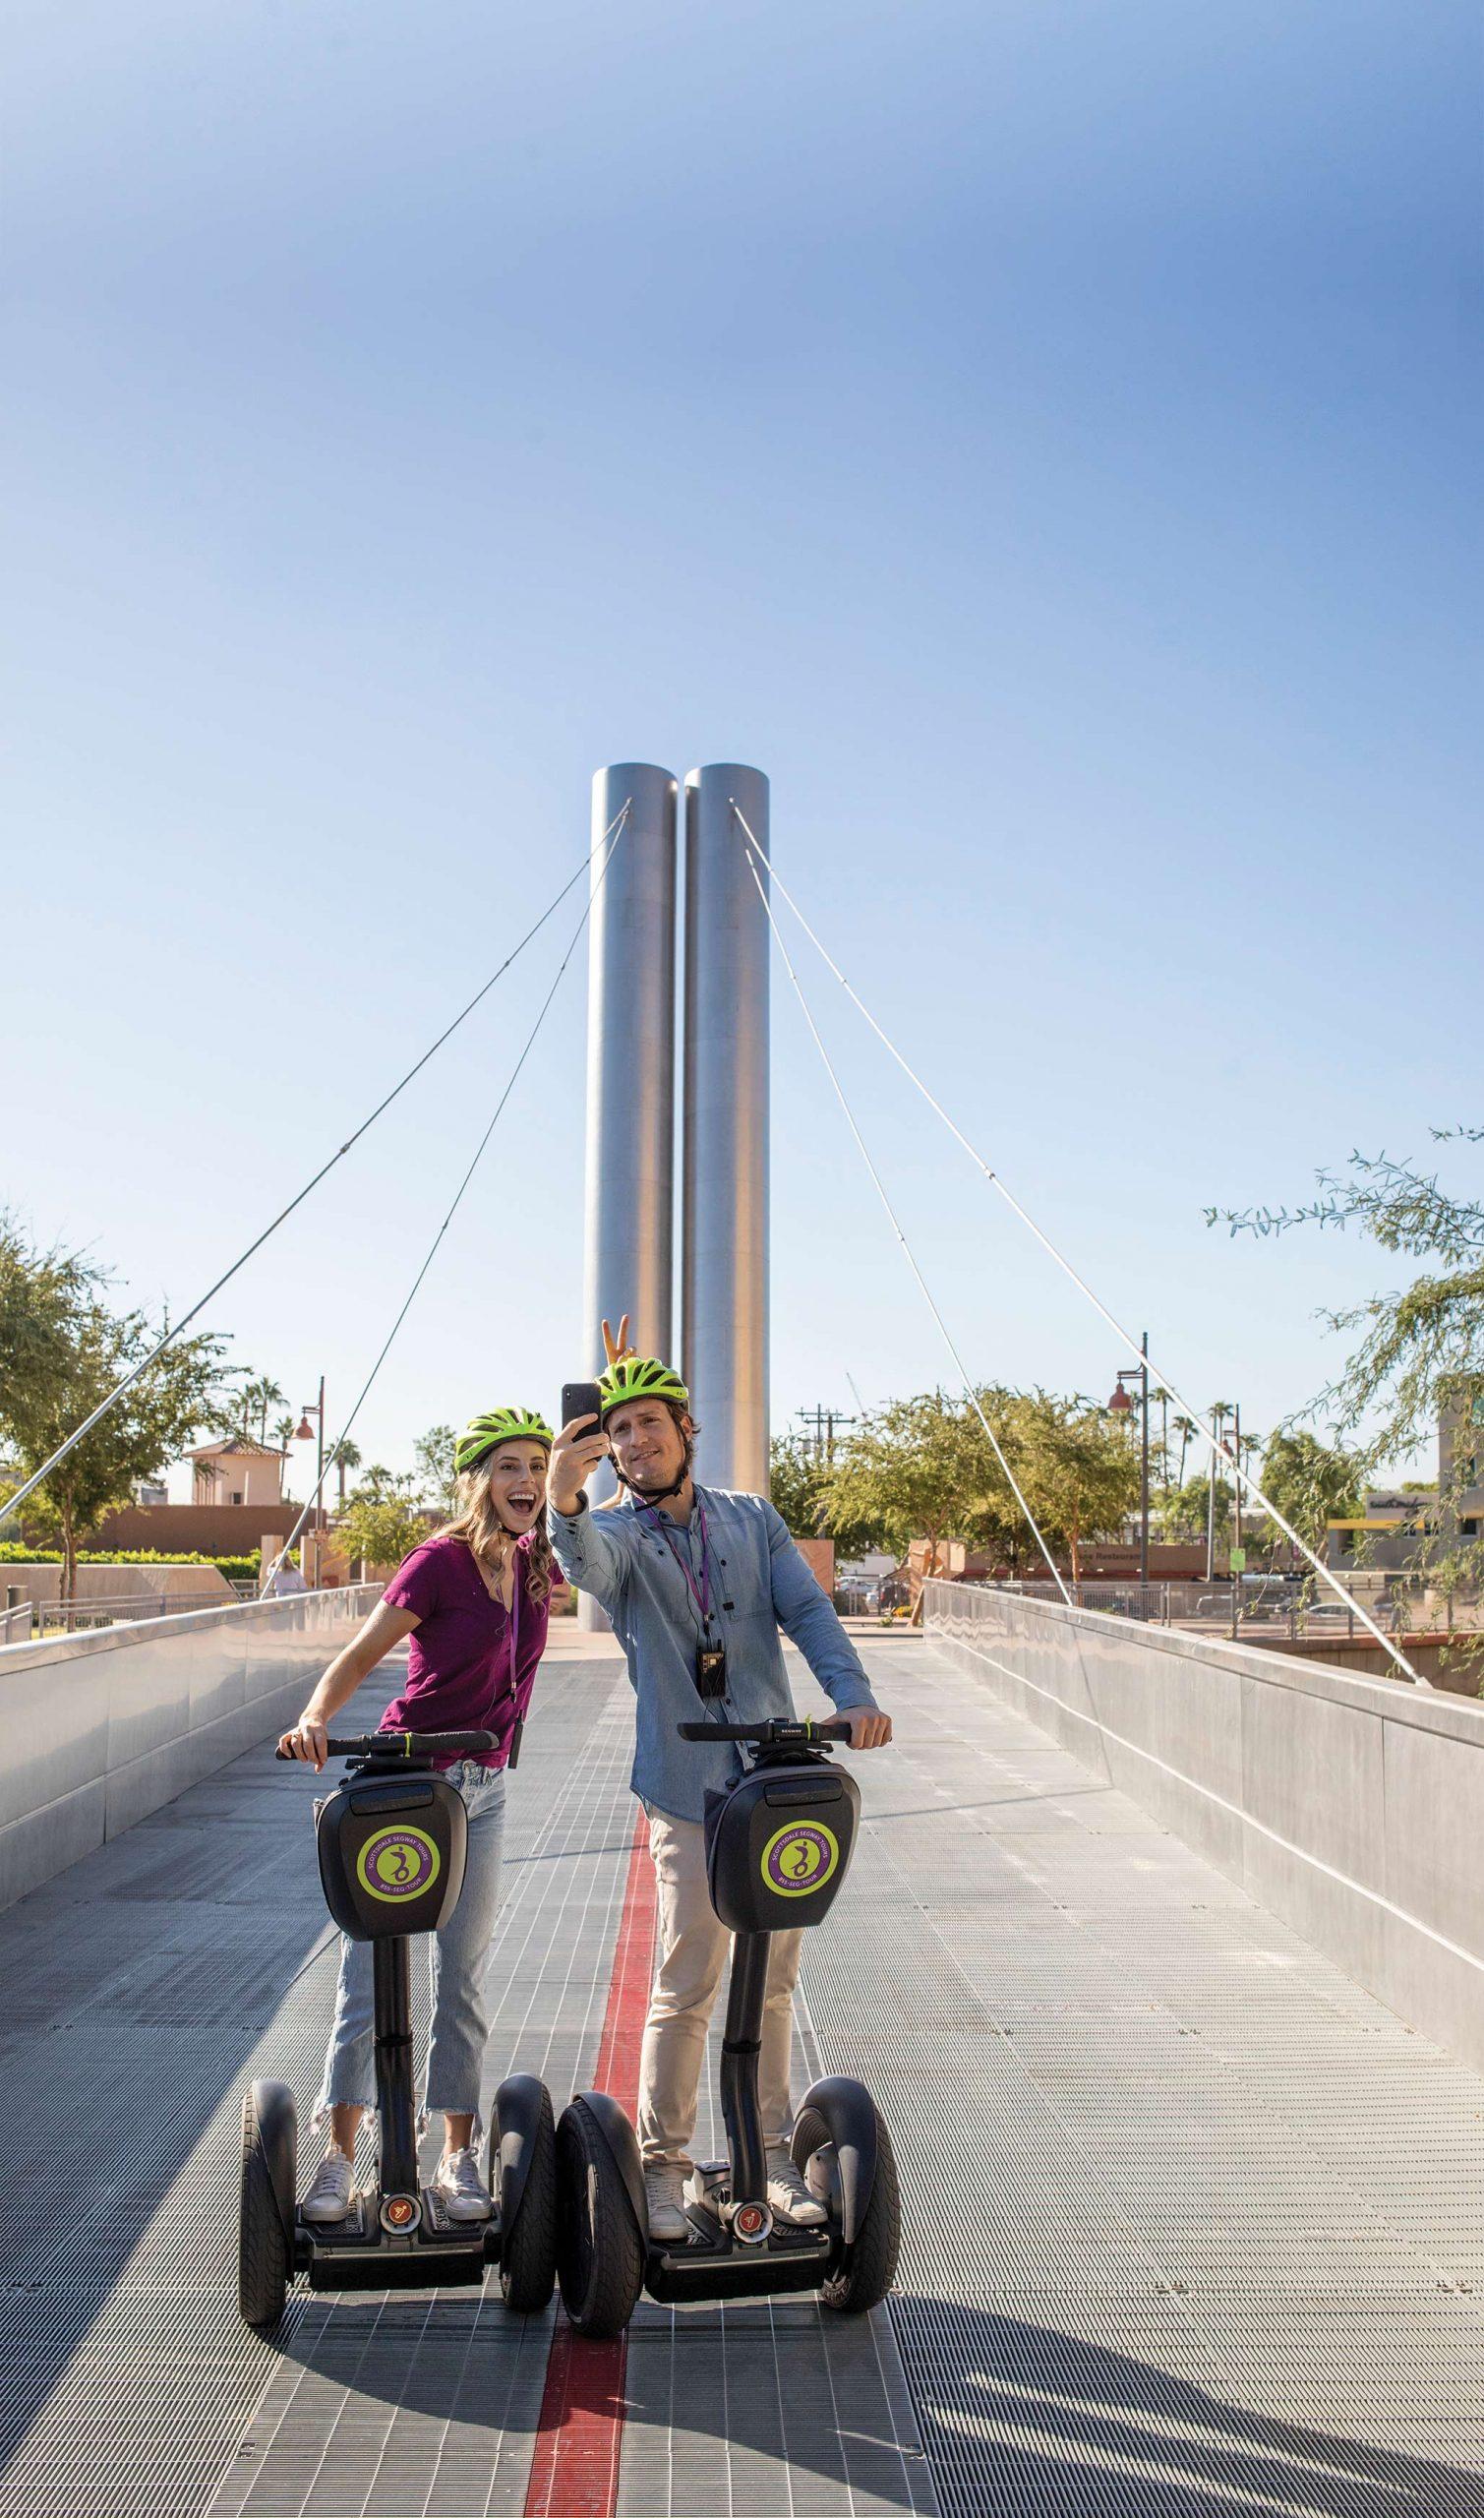 Scottsdale Segway Tours; Photography by Mark Lipczynski